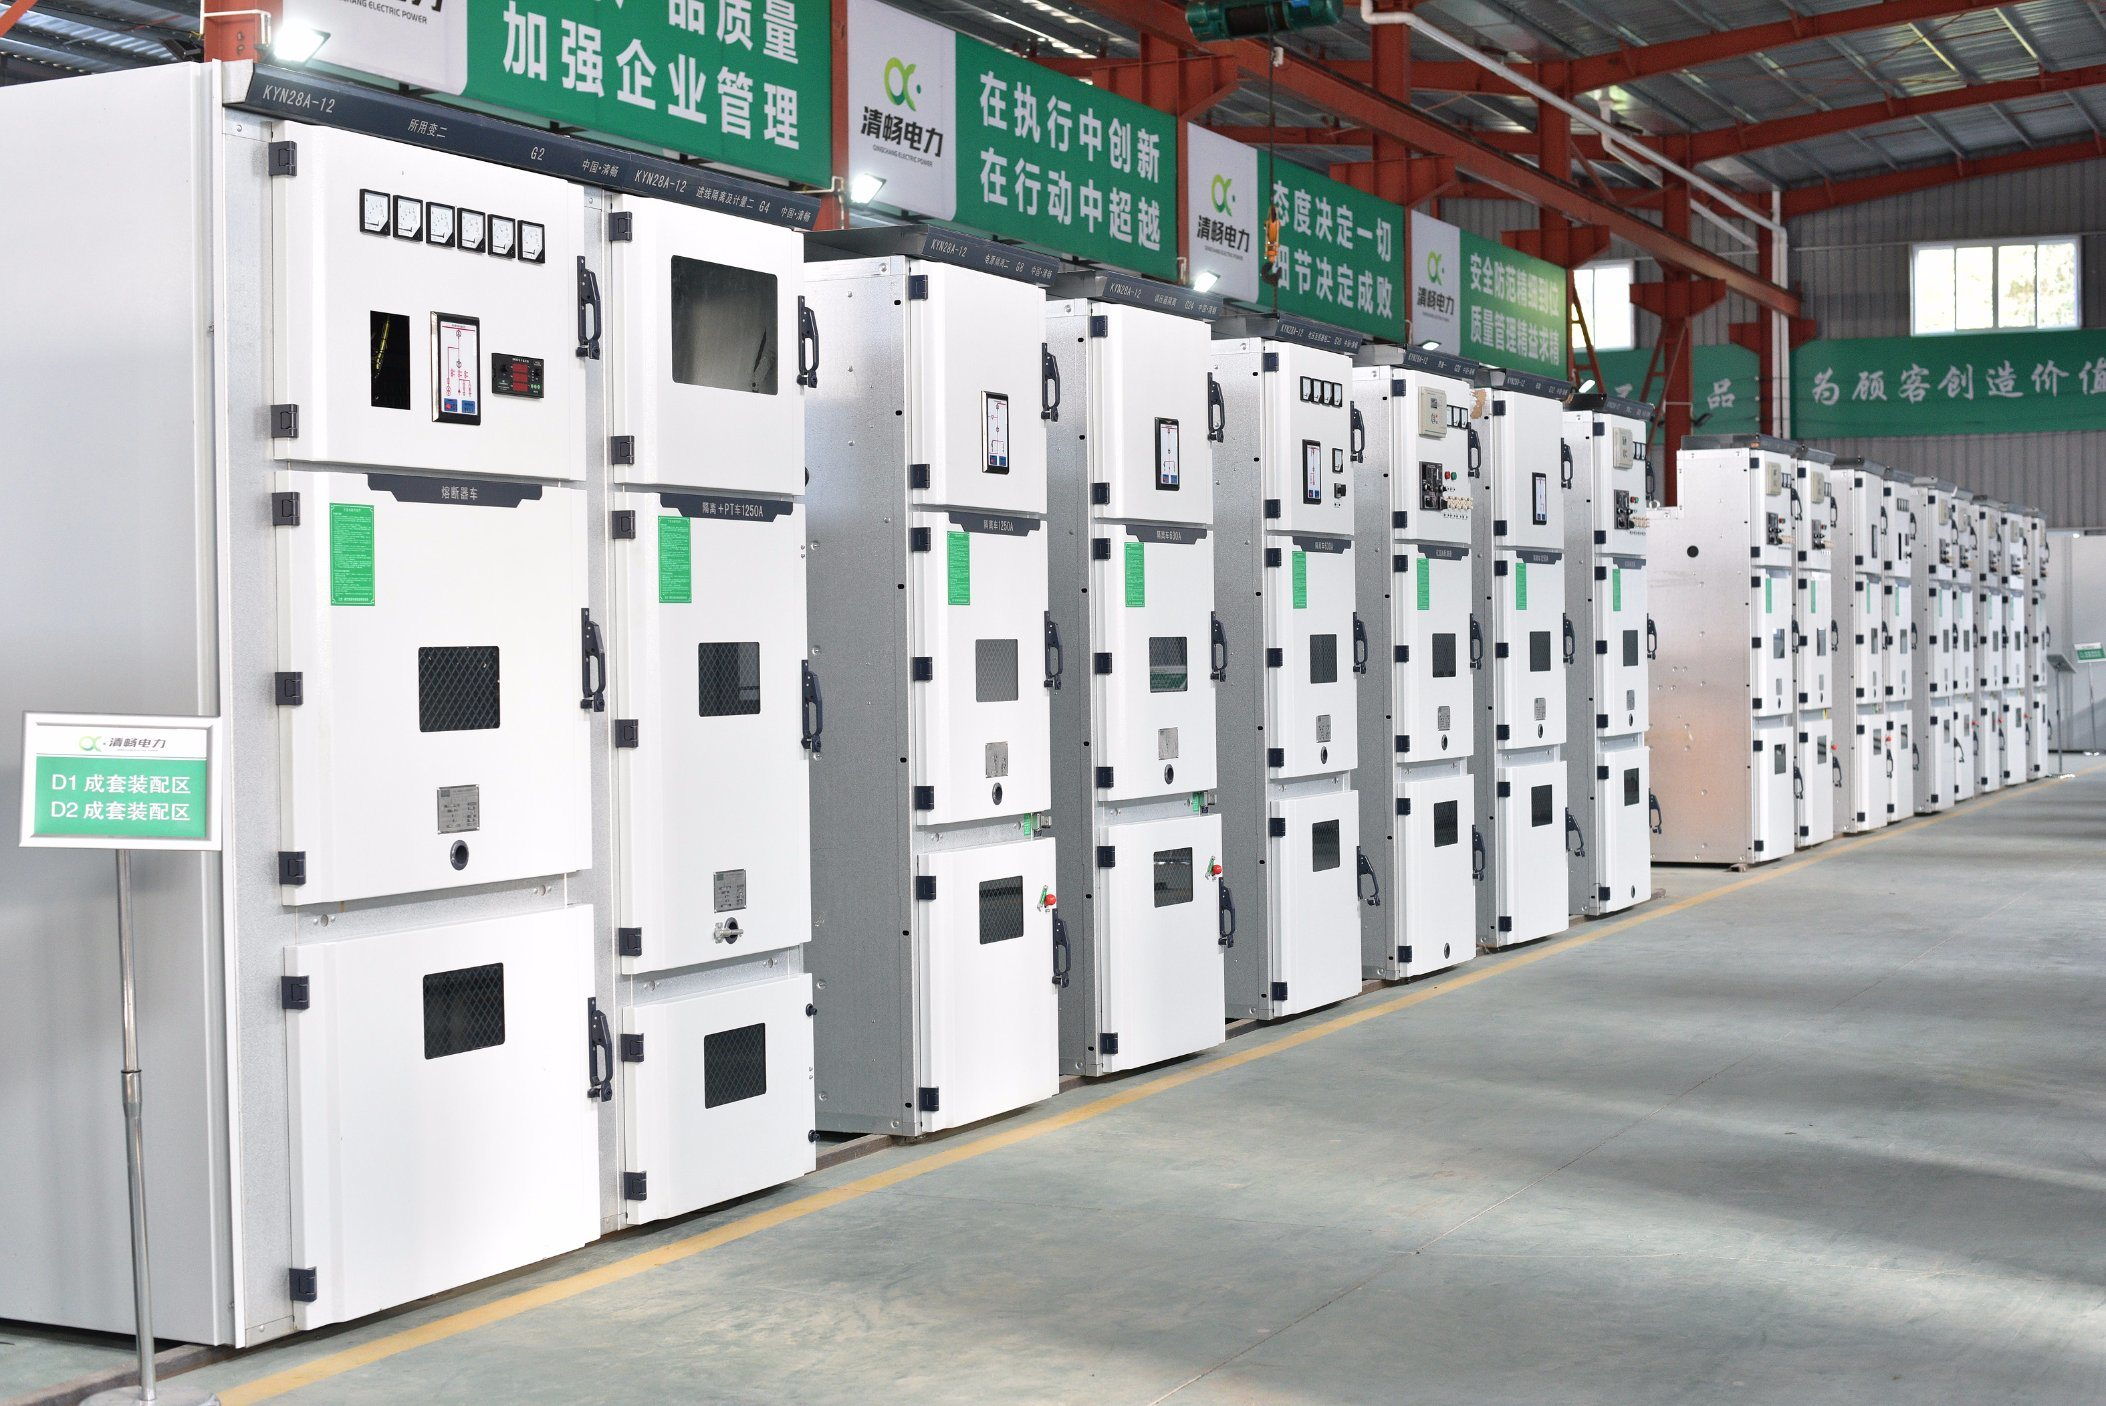 Kyn28A-12 (12Kv) High Voltage Switch Board/Distribution Switchgear/ Cabniet